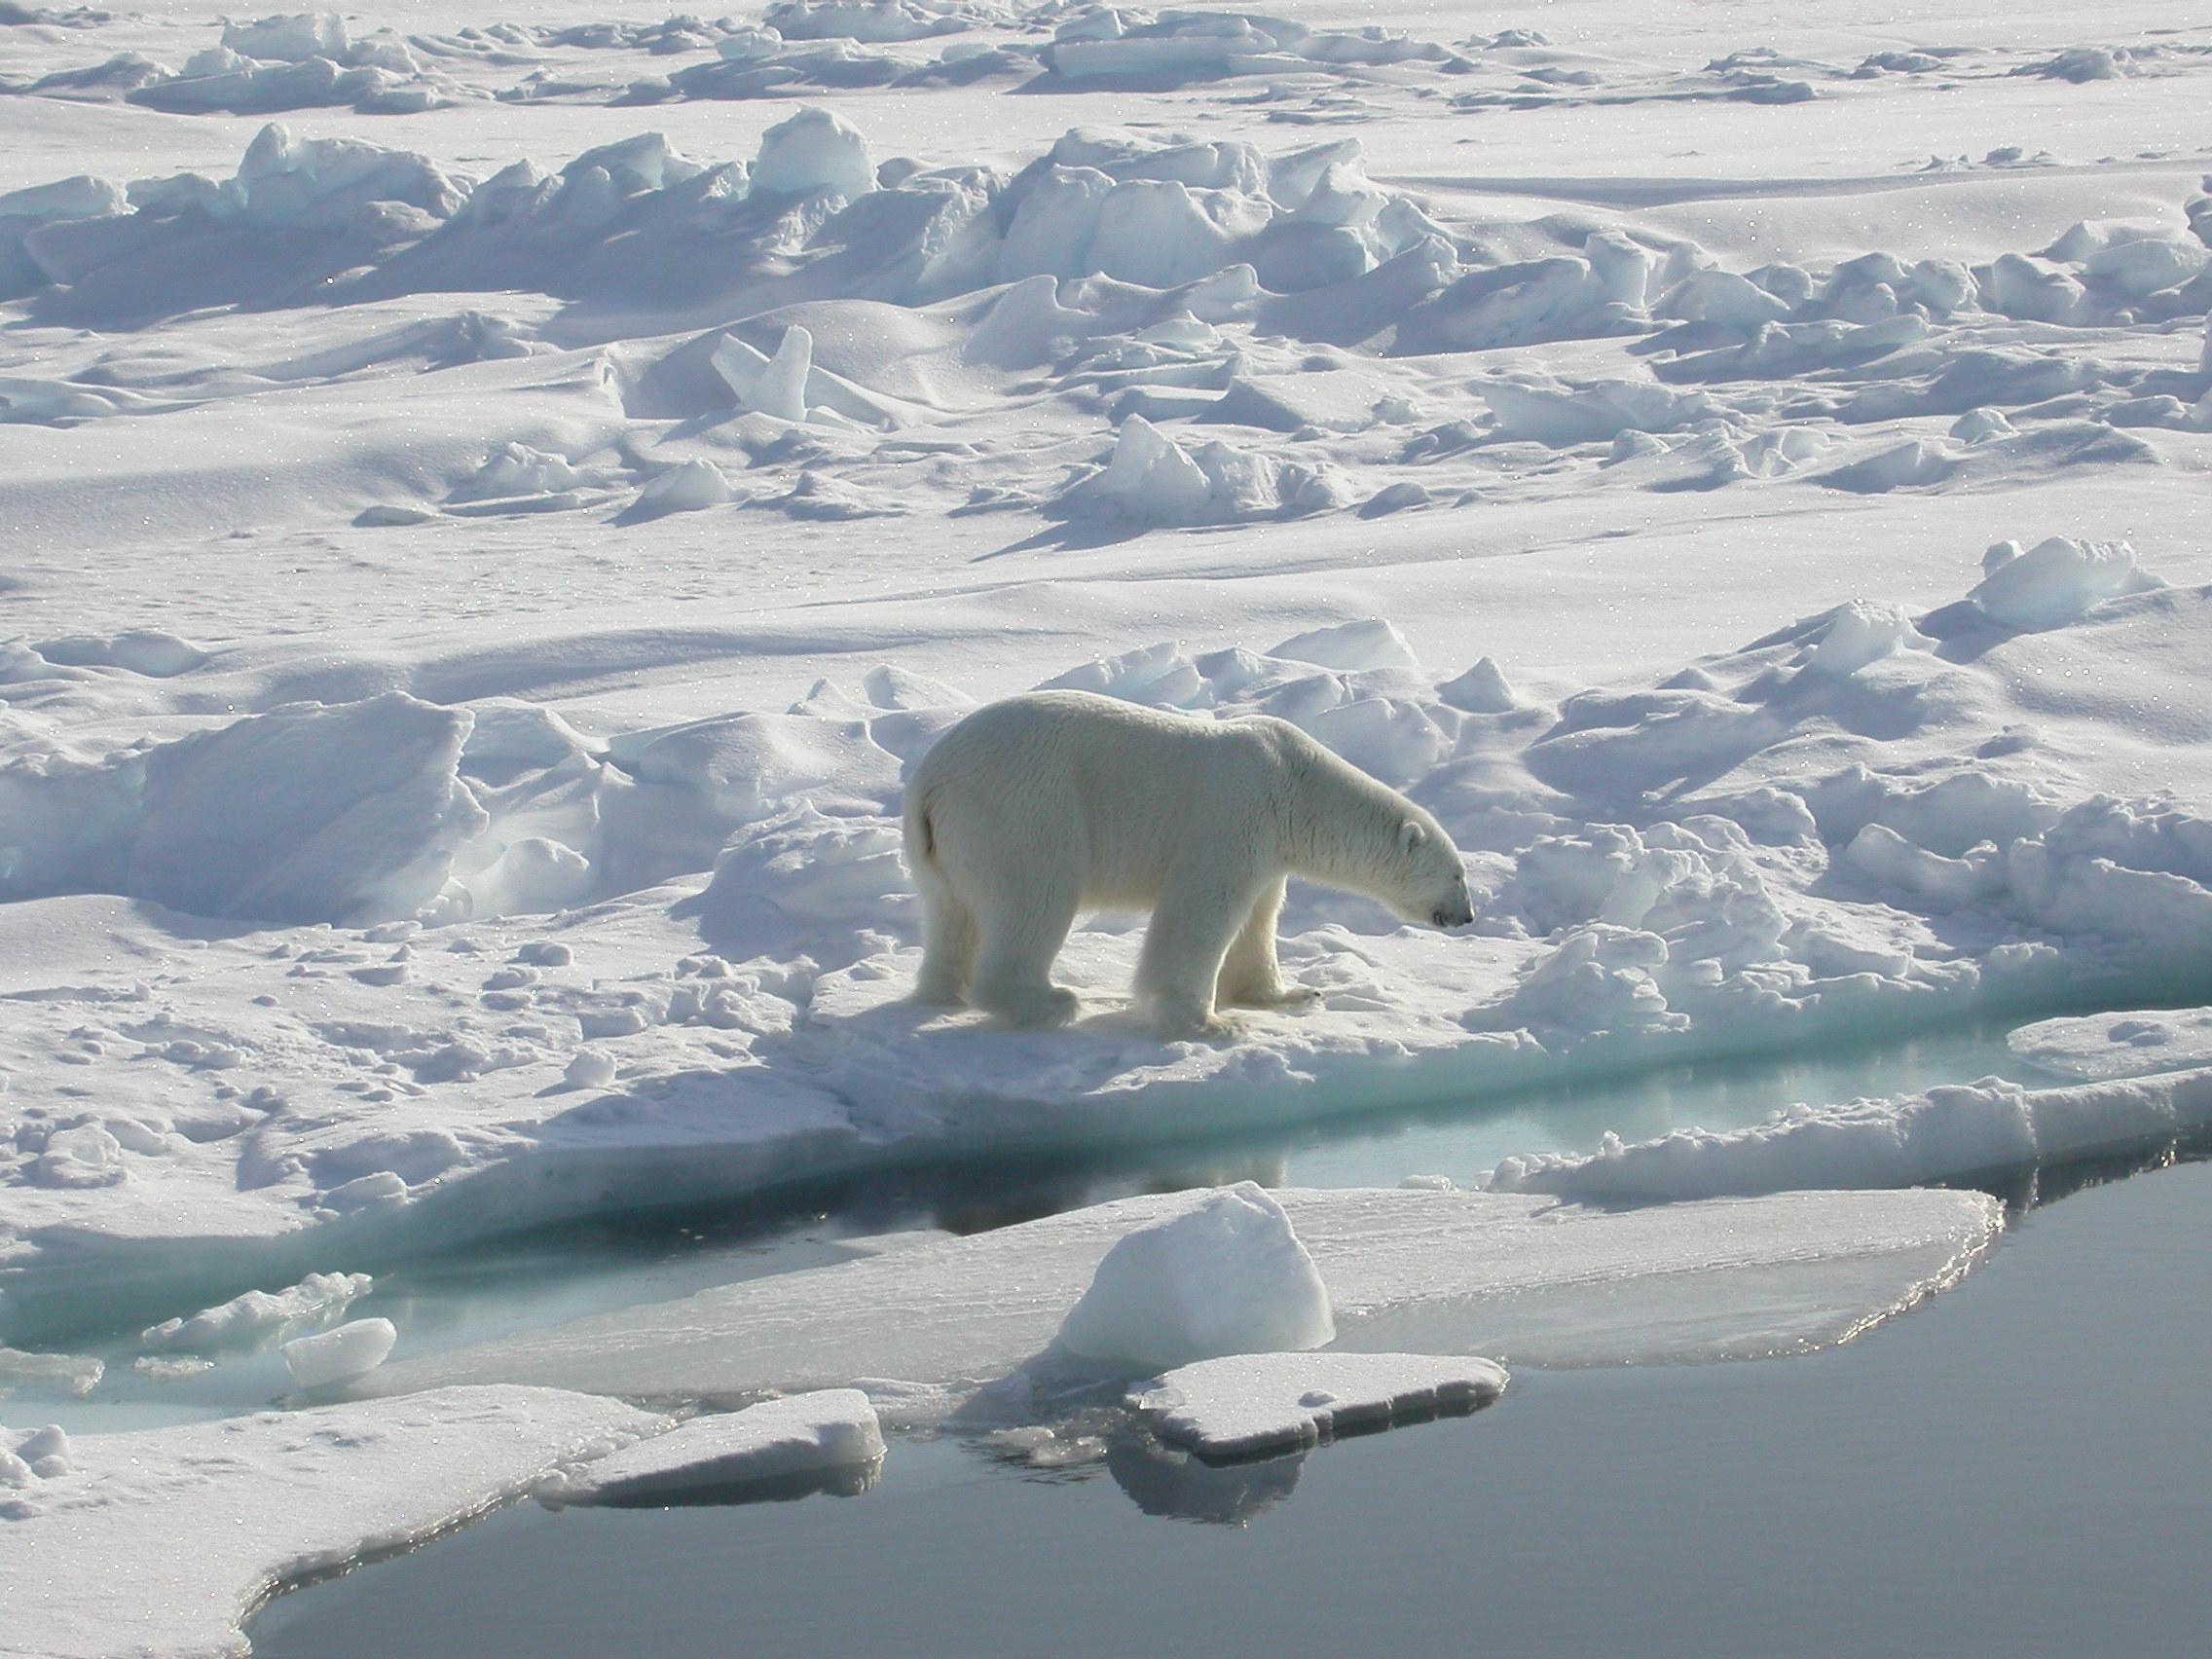 Polarbear - CONFLUX